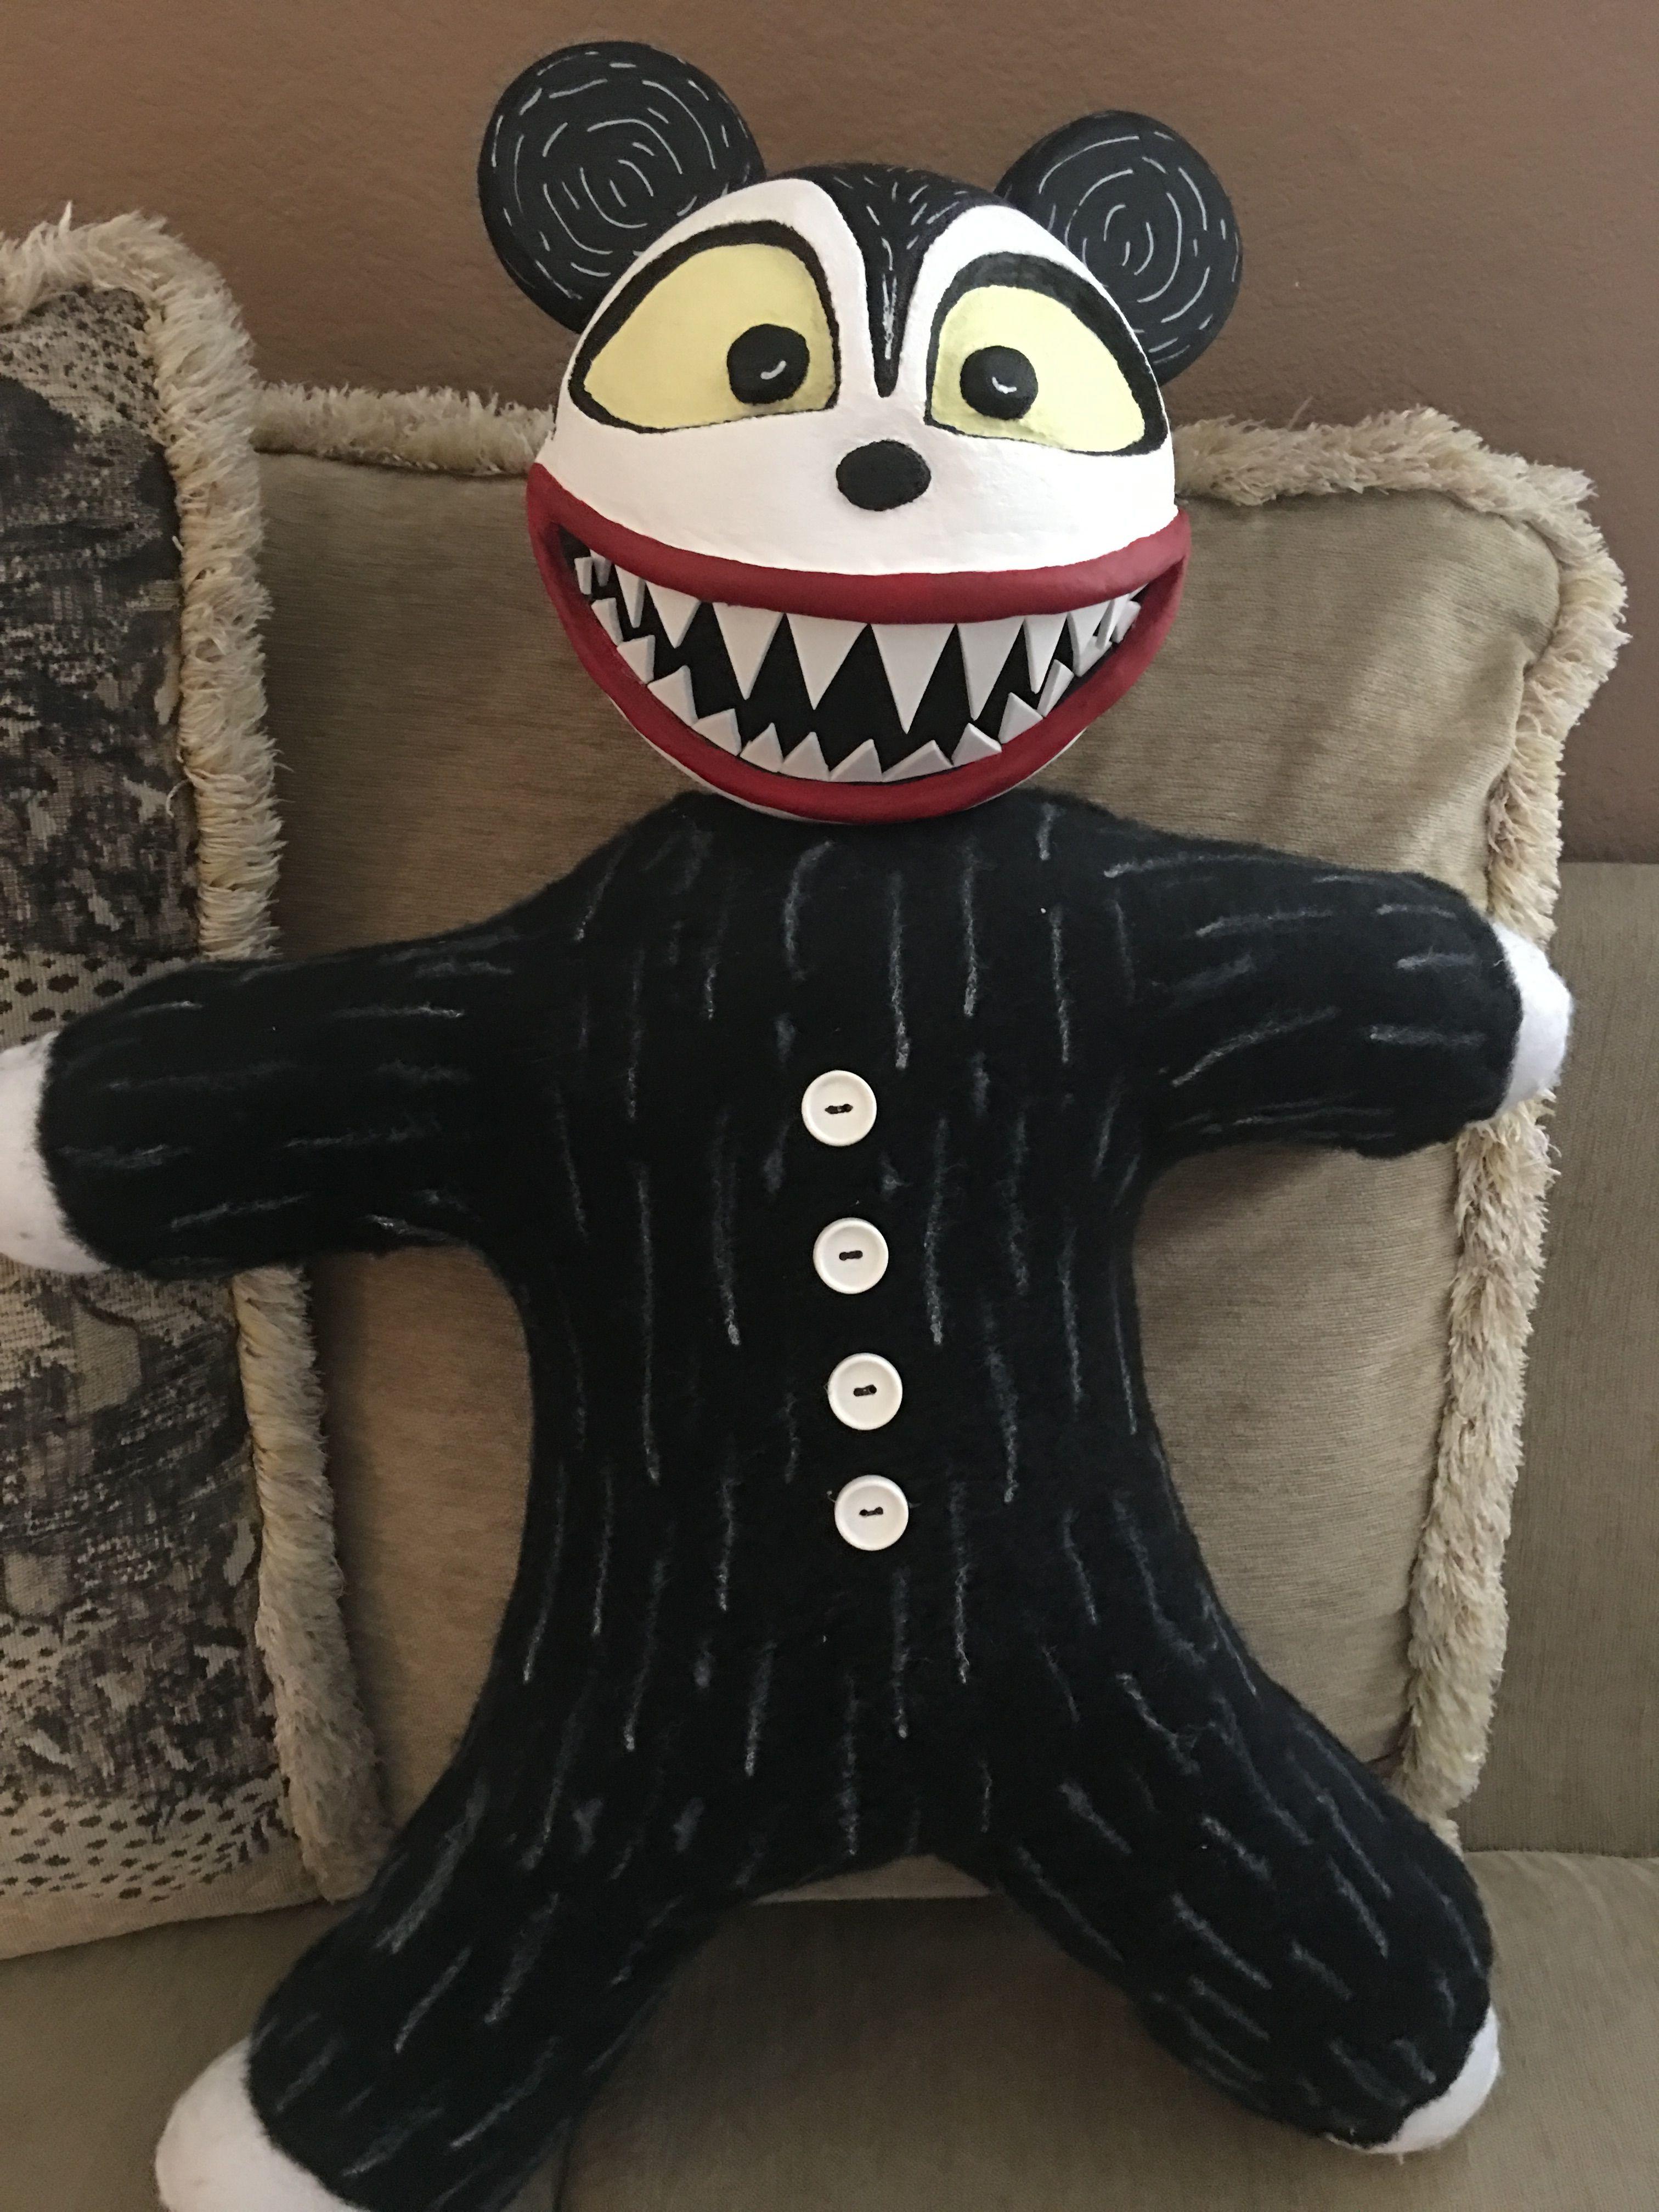 My DIY Vampire Teddy from The Nightmare Before Christmas